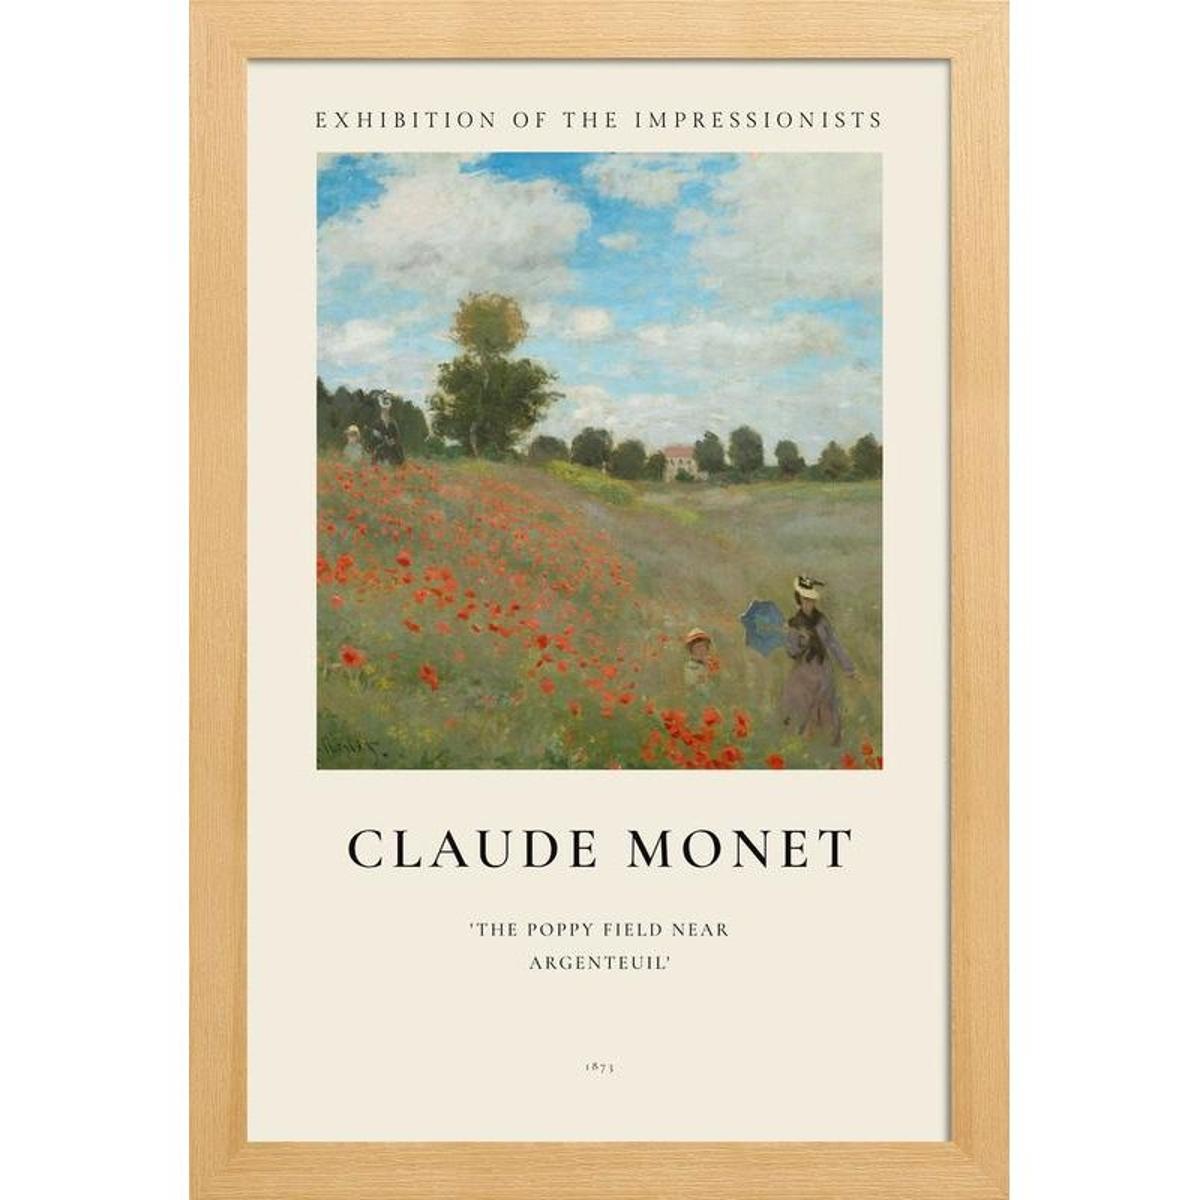 Poster - Monet - The Poppy Field near Argenteuil - Claude Monet en Blanc ivoire & Vert